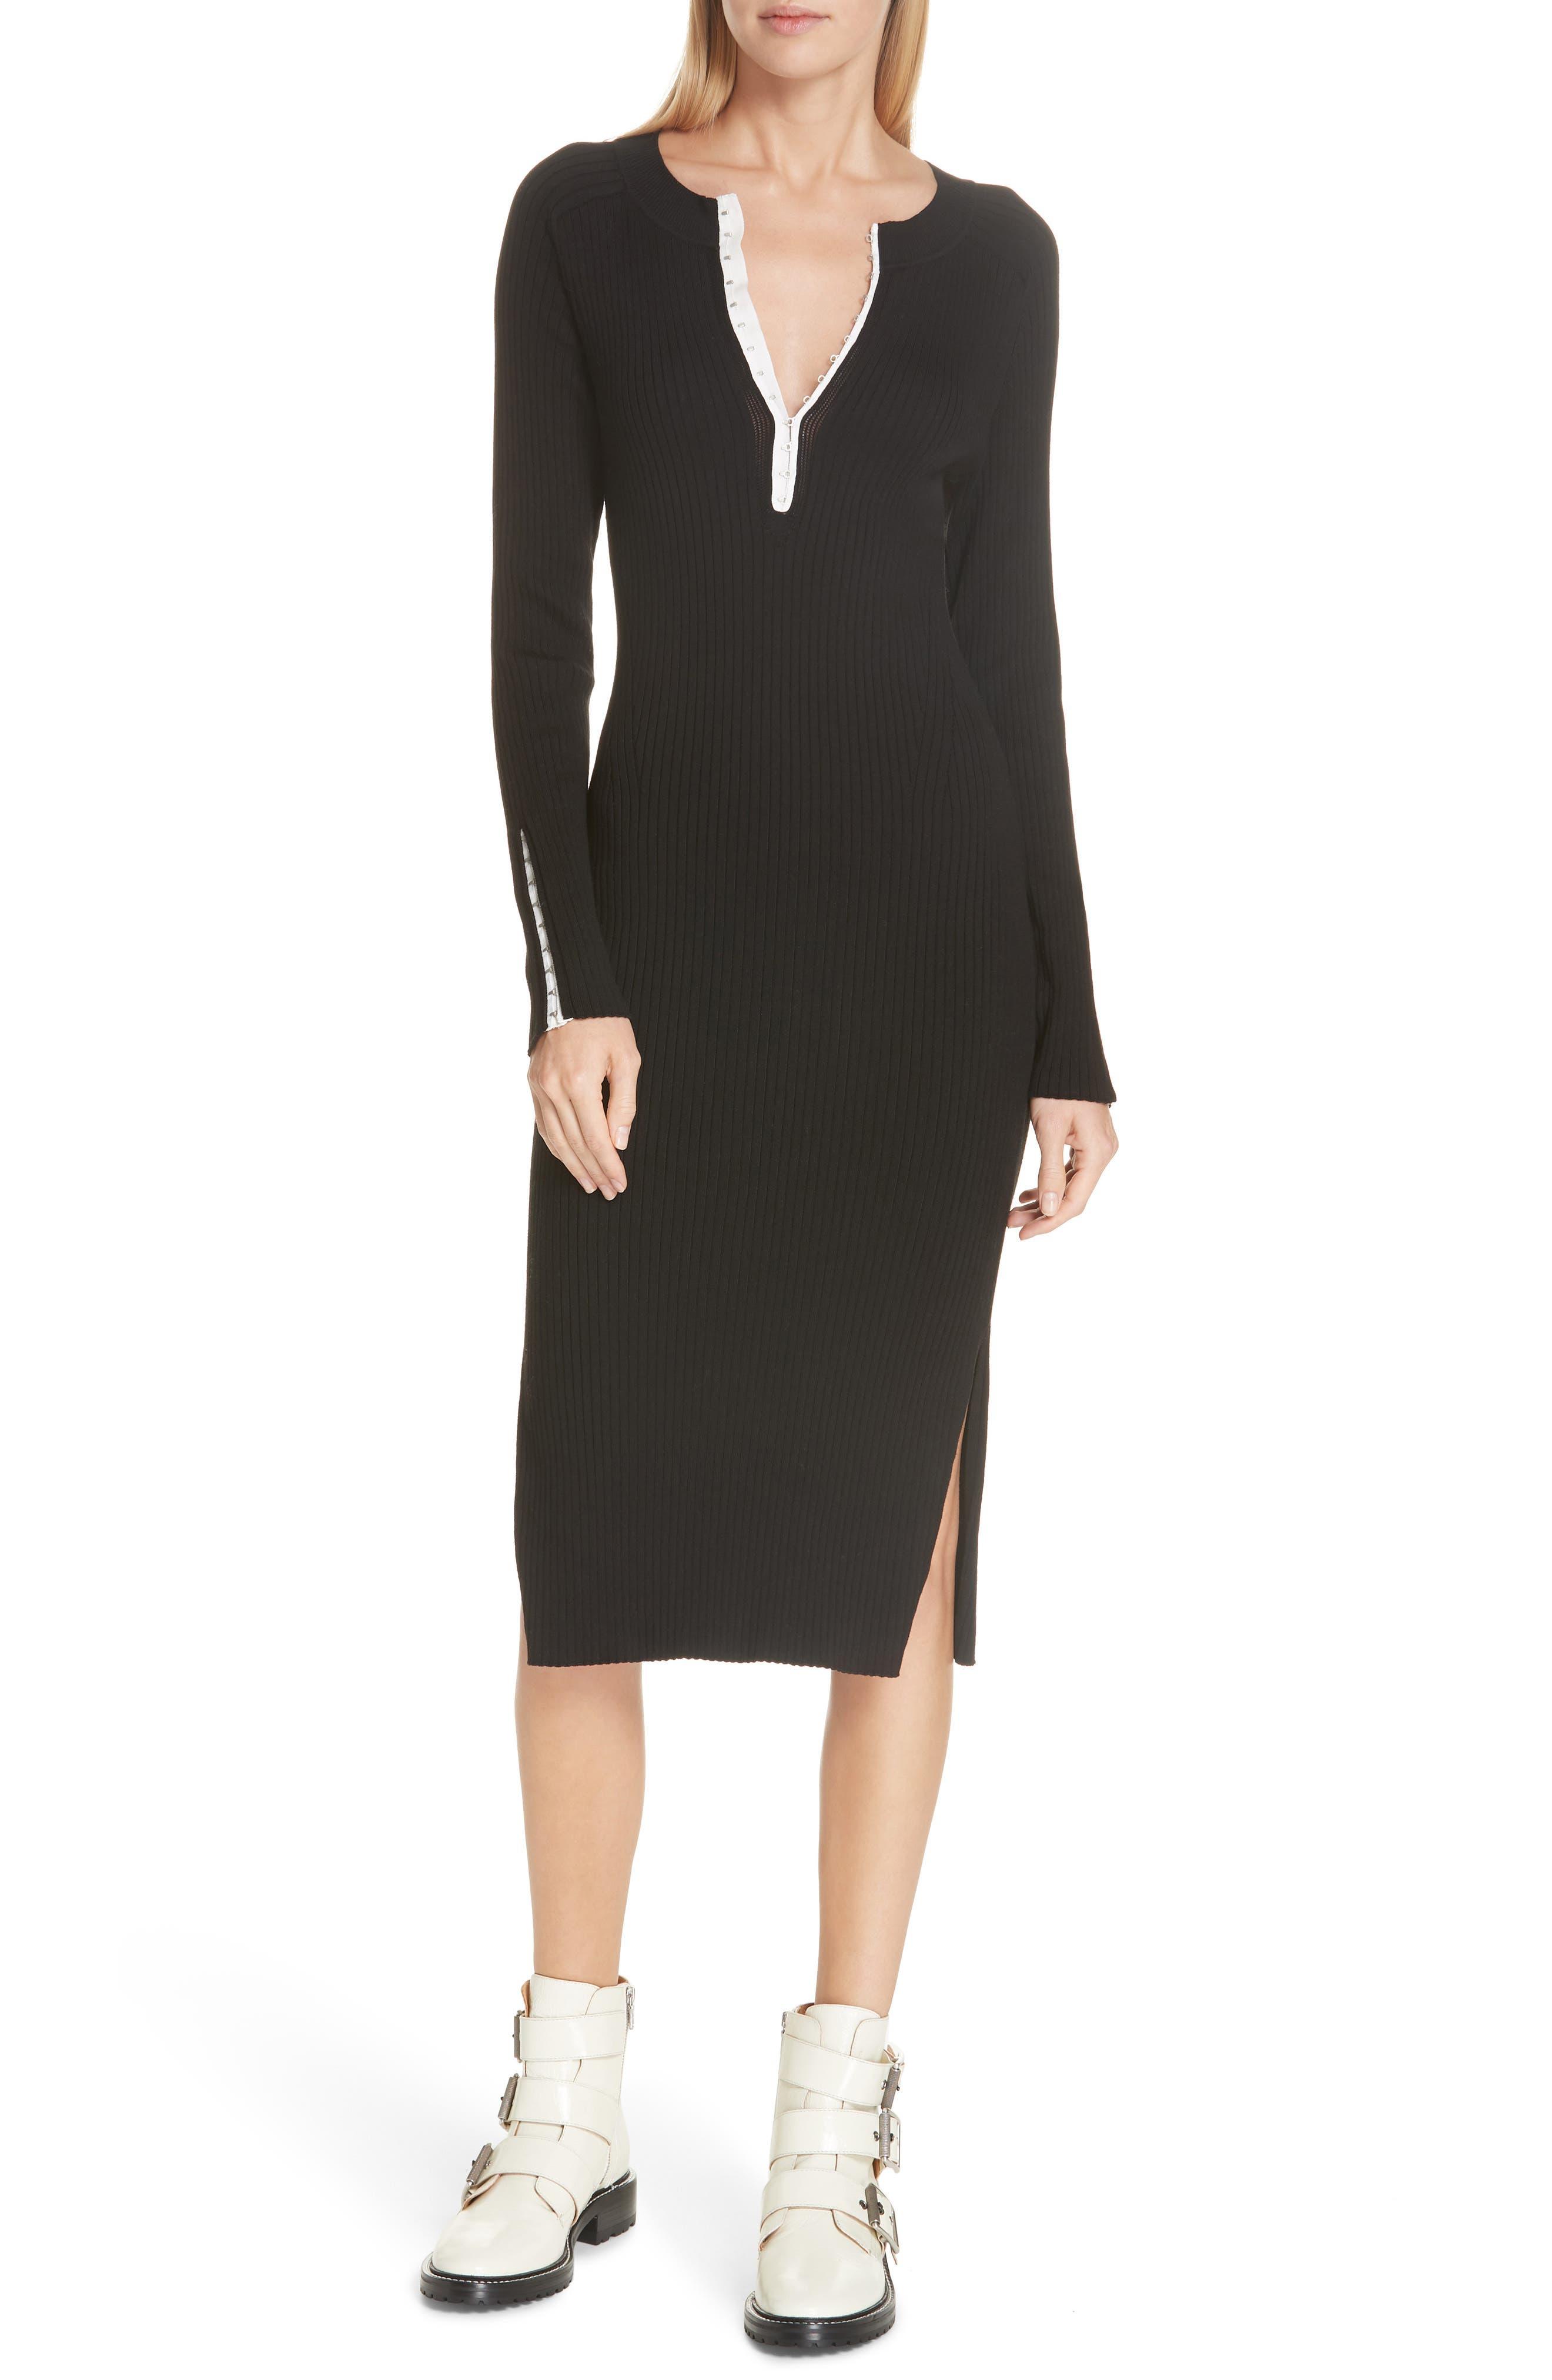 RAG & BONE,                             Brynn Rib Knit Dress,                             Main thumbnail 1, color,                             BLACK